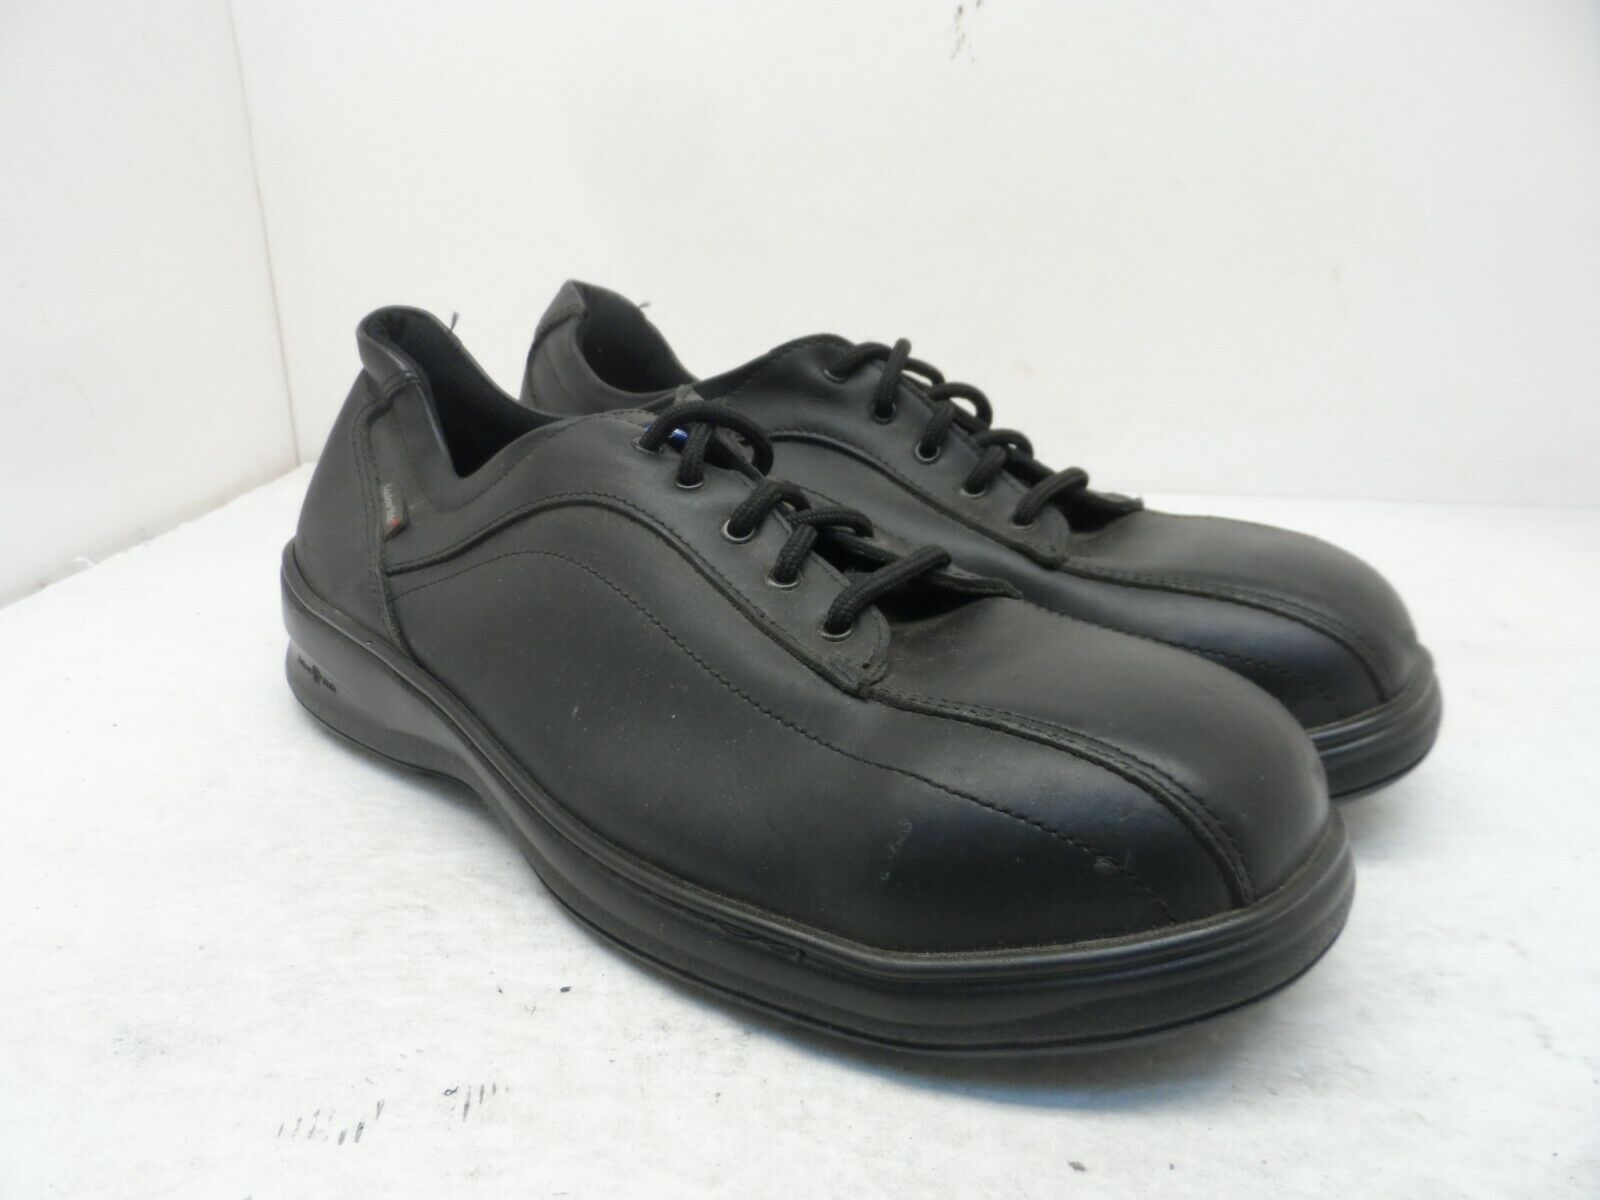 Mellow Walk Men's PATRICK 2 Lace-Up Steel Toe Work Shoes 545202 Black Size 10EE